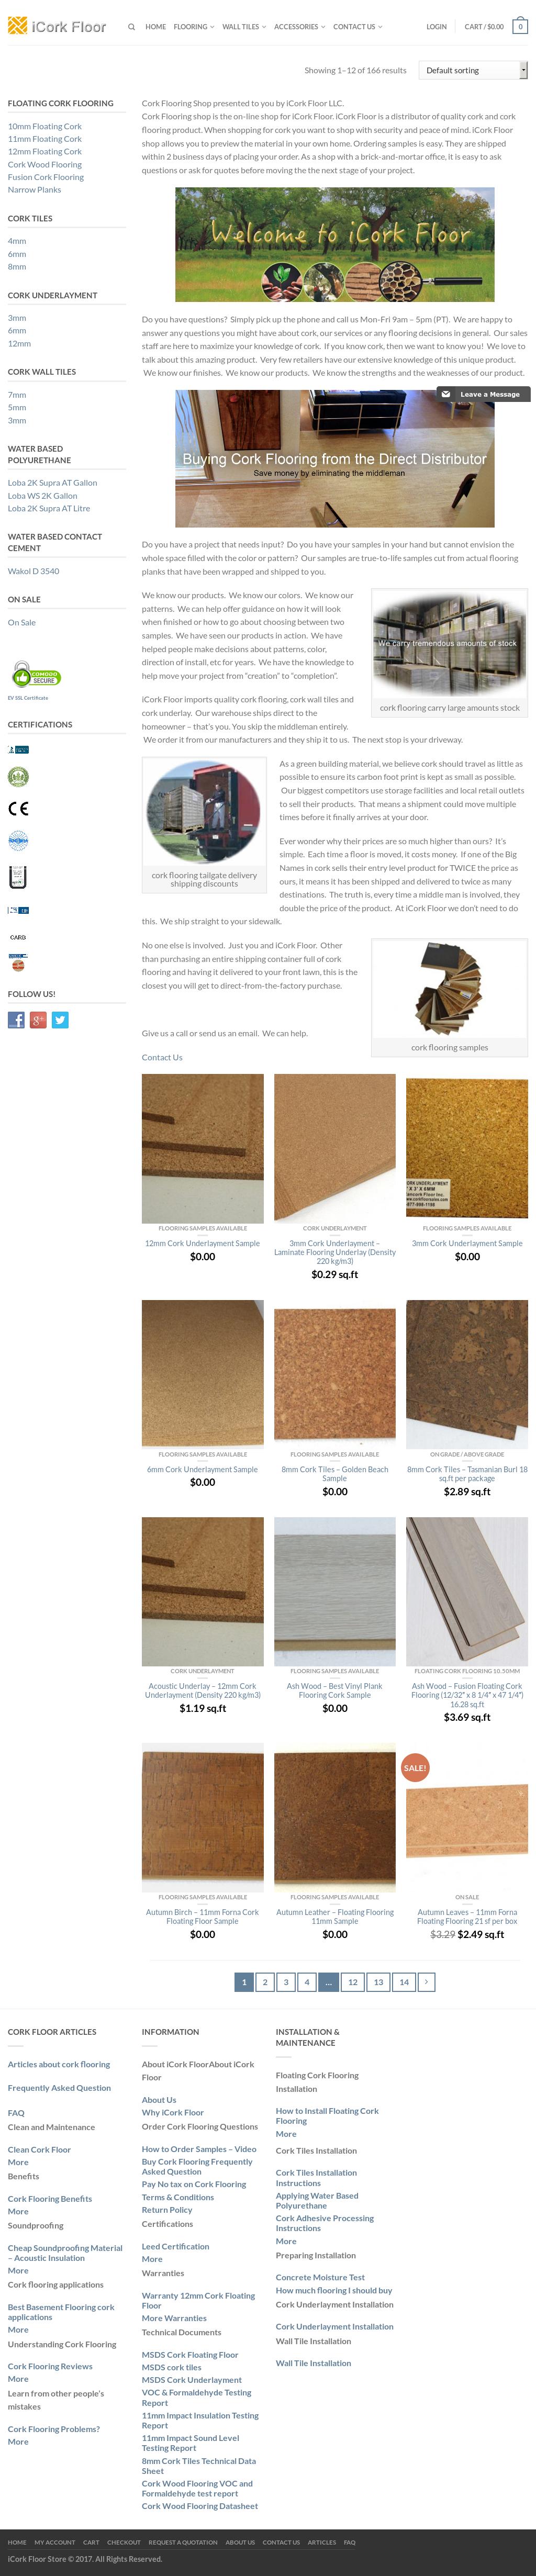 Icork Floor Website History